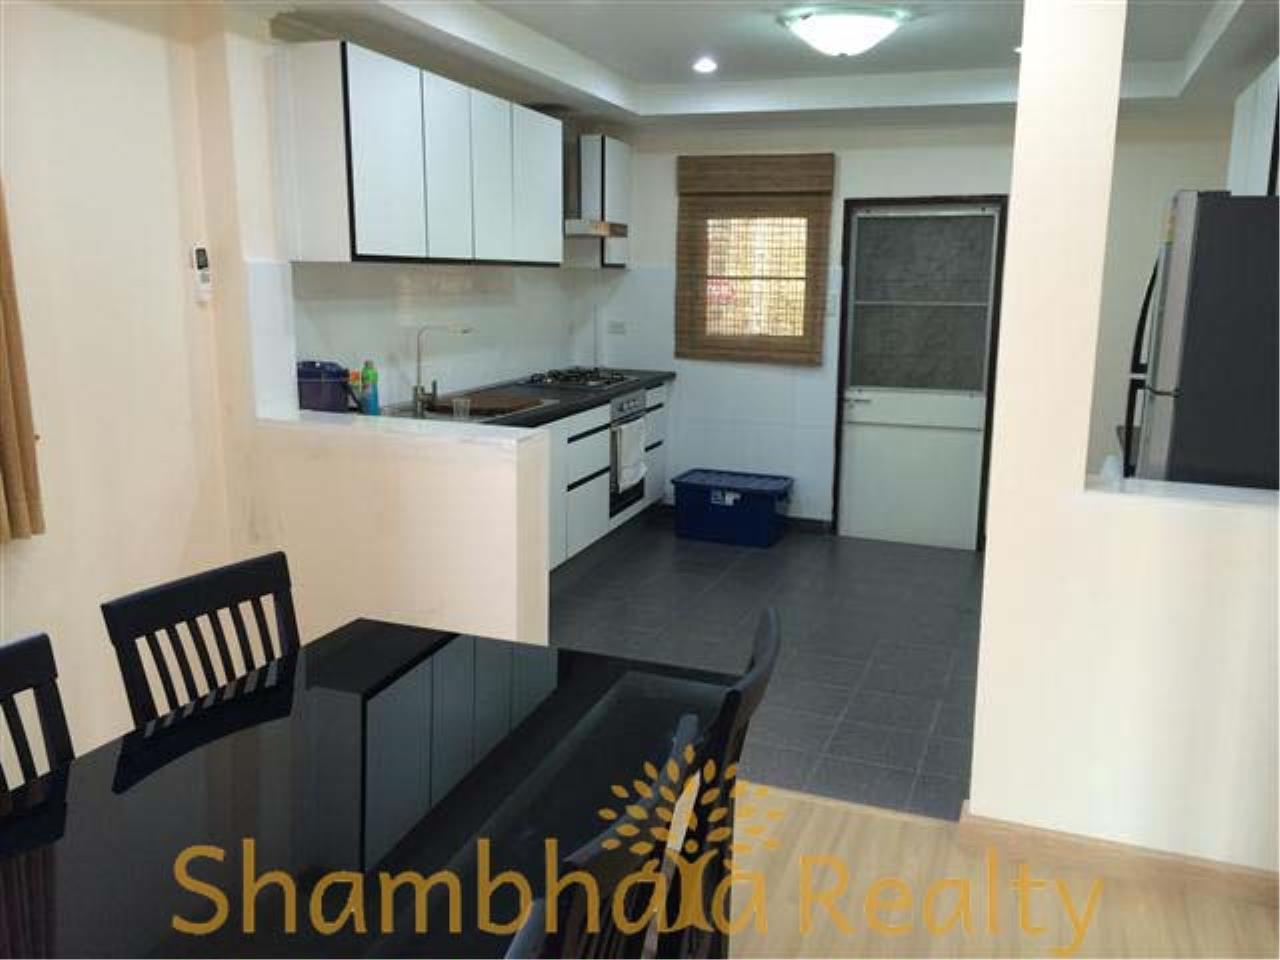 Shambhala Realty Agency's Single house to rent at Lassalle 22 Condominium for Rent in Sukhumvit Soi 101, Lassalle 22 4